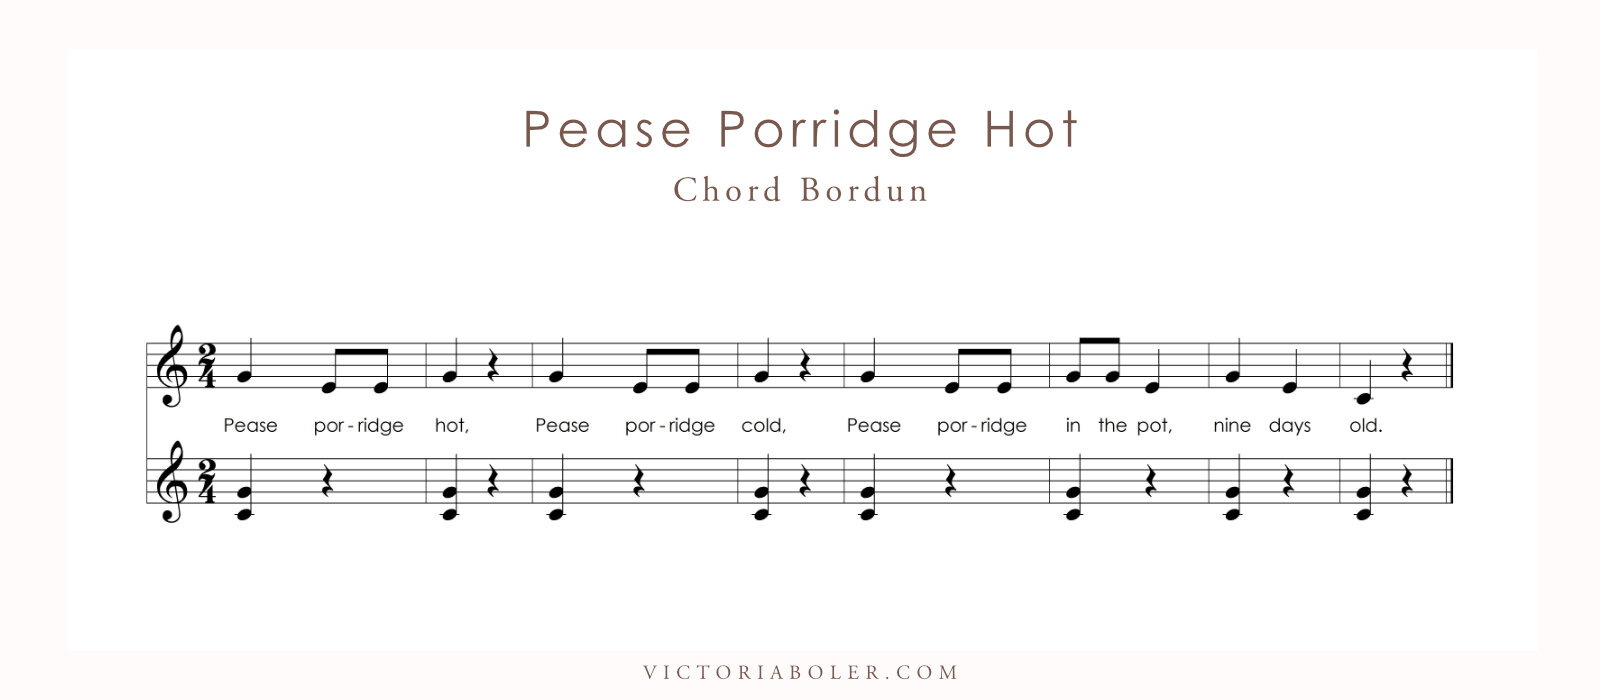 Pease Porridge Hot Chord Bordun